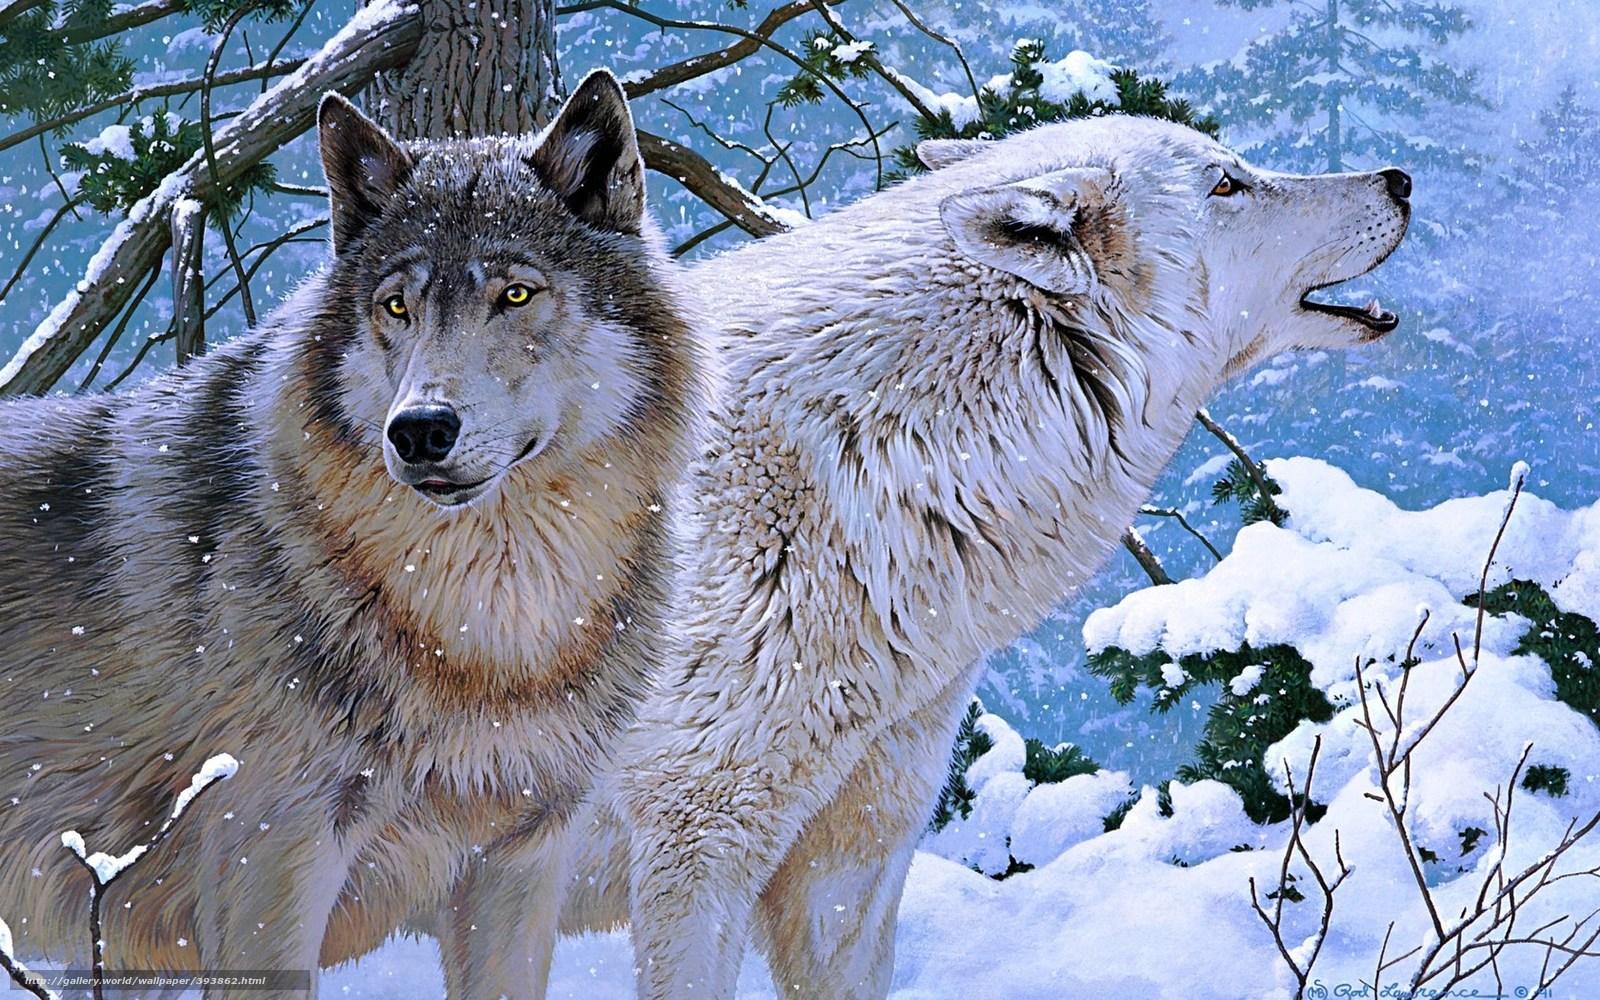 Картинка волки целуются - bb4